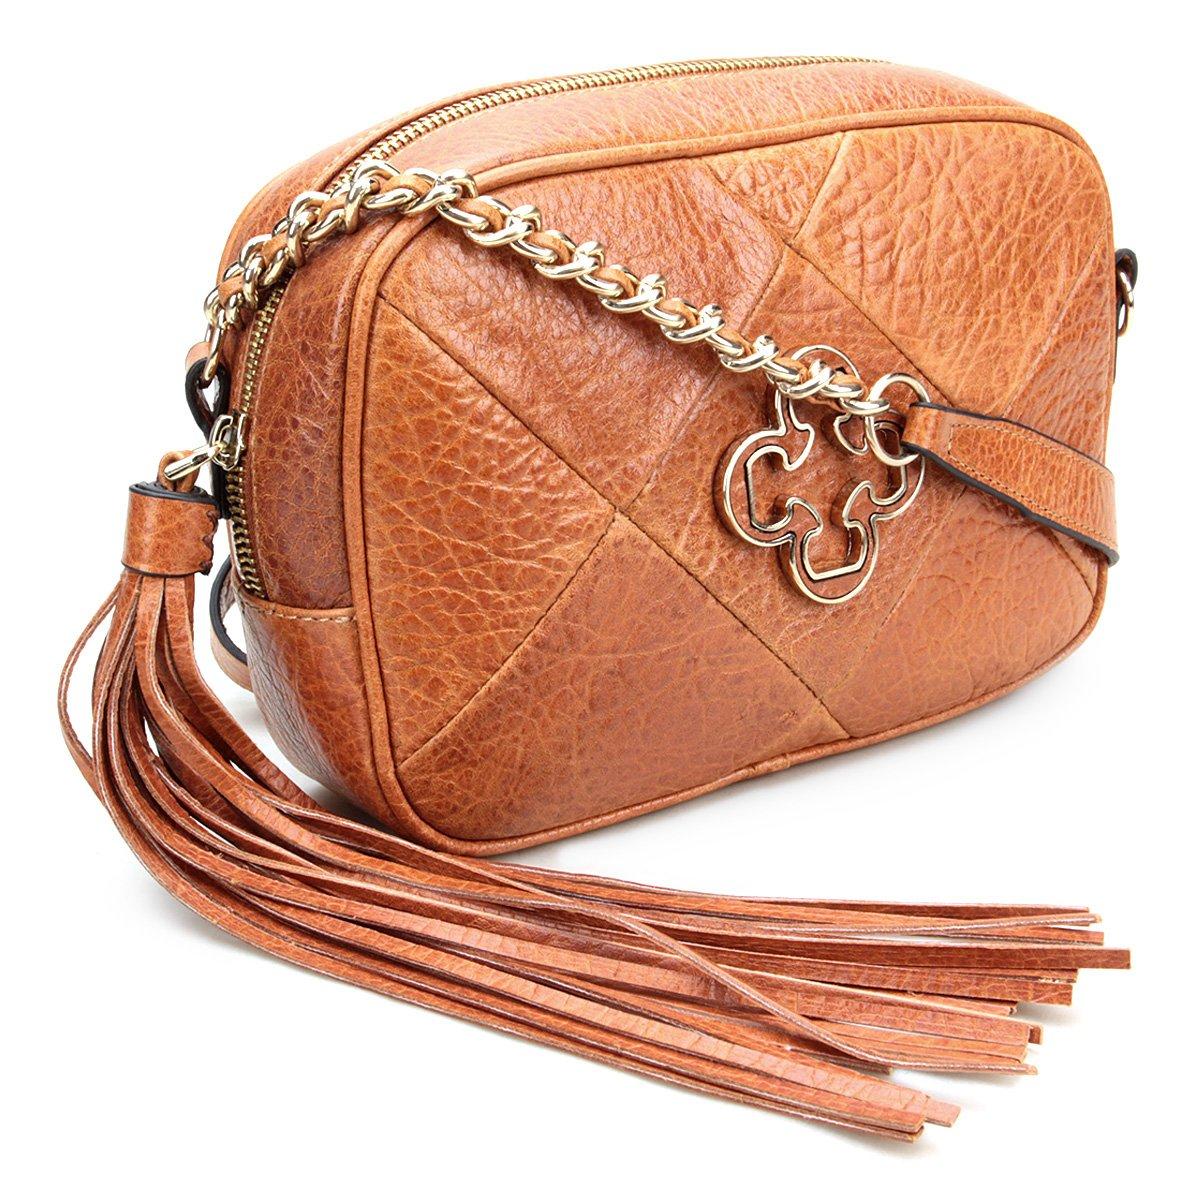 Mini Caramelo Bolsa Couro Capodarte Bag Capodarte Couro Feminina Mini Bolsa dwz1TH